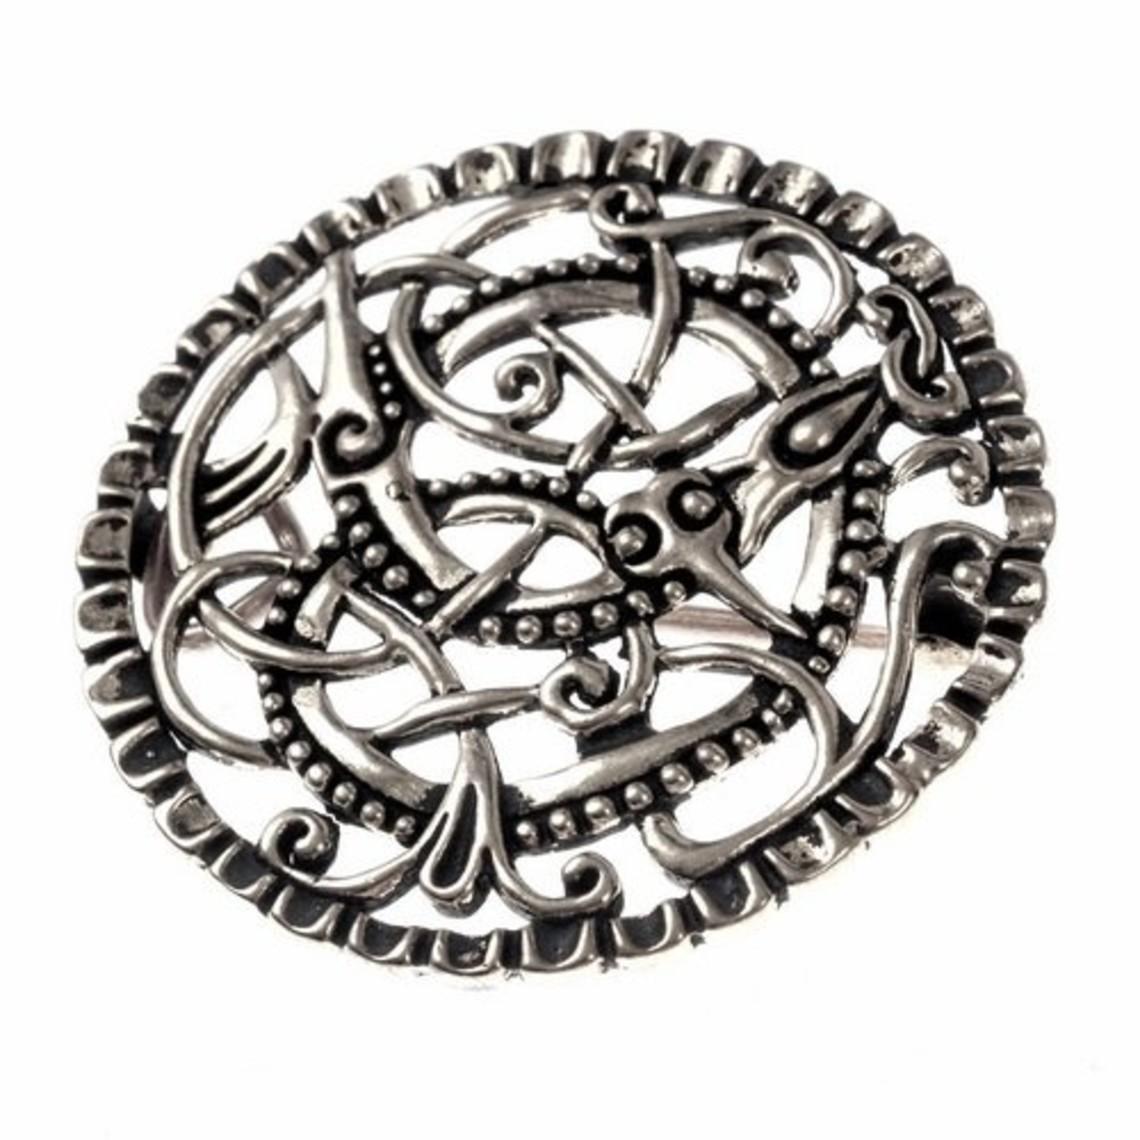 Pitney broche, de bronce plateado